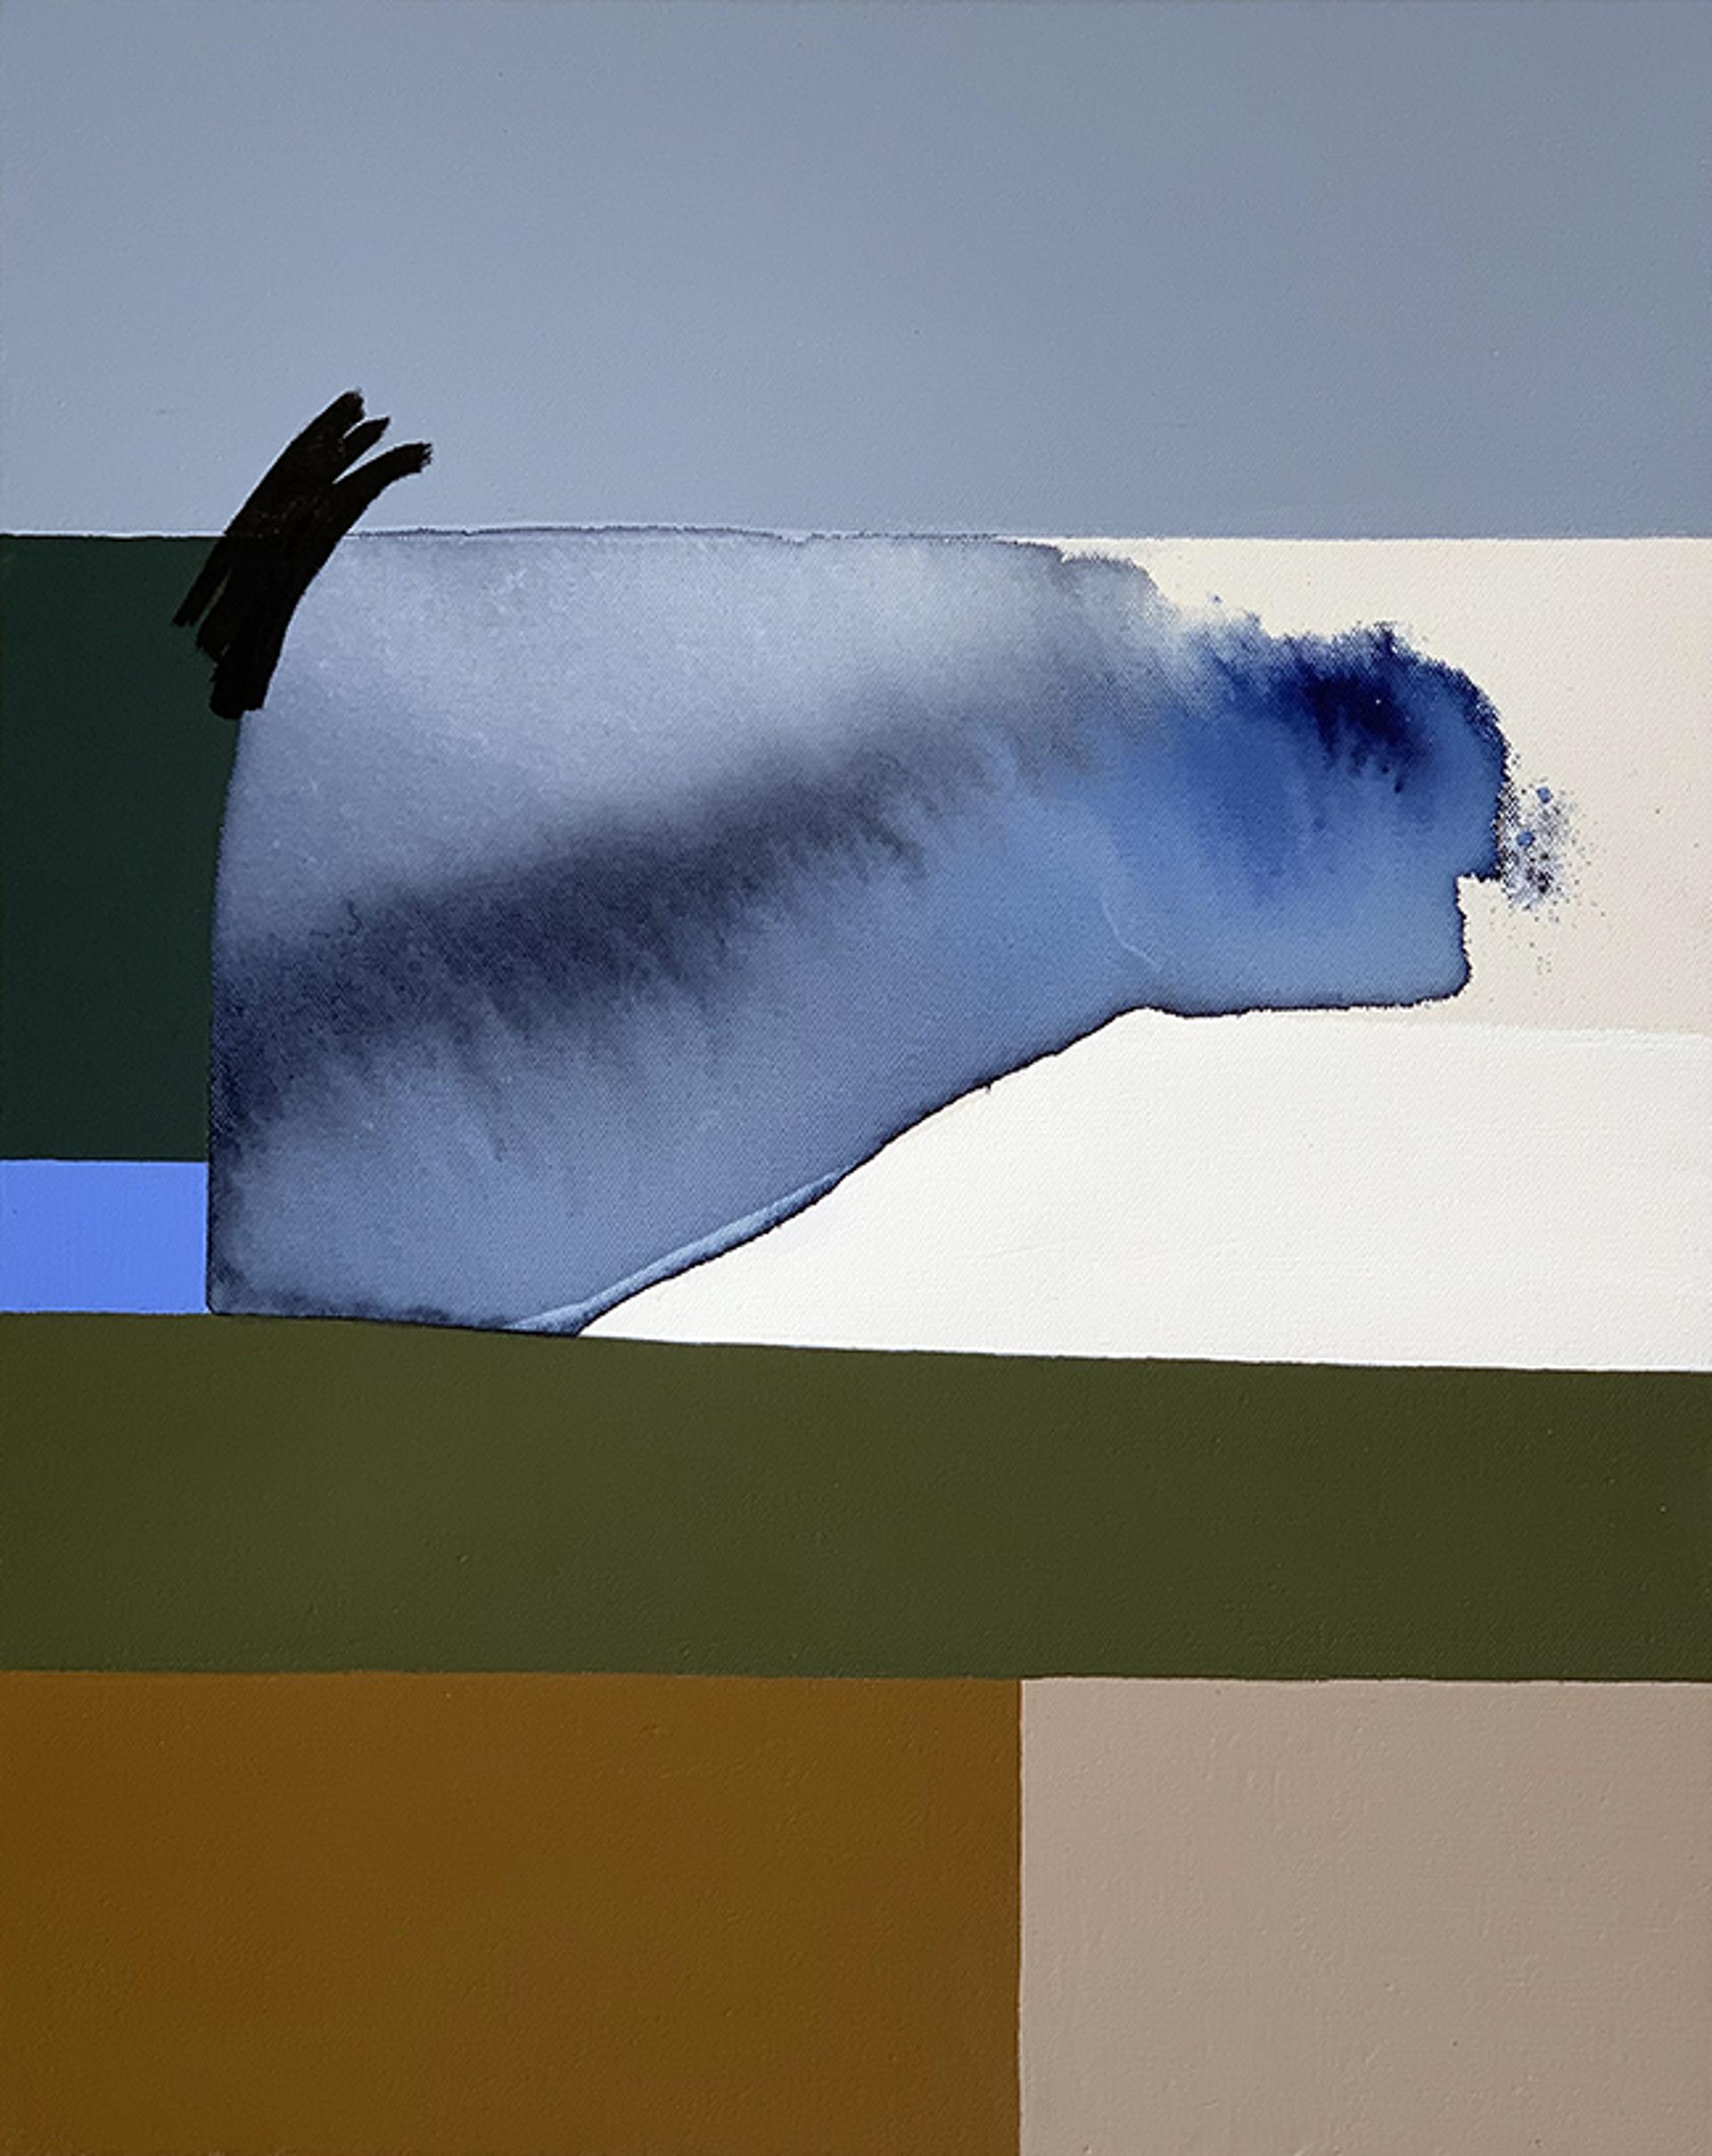 Montaine by Karina Bania